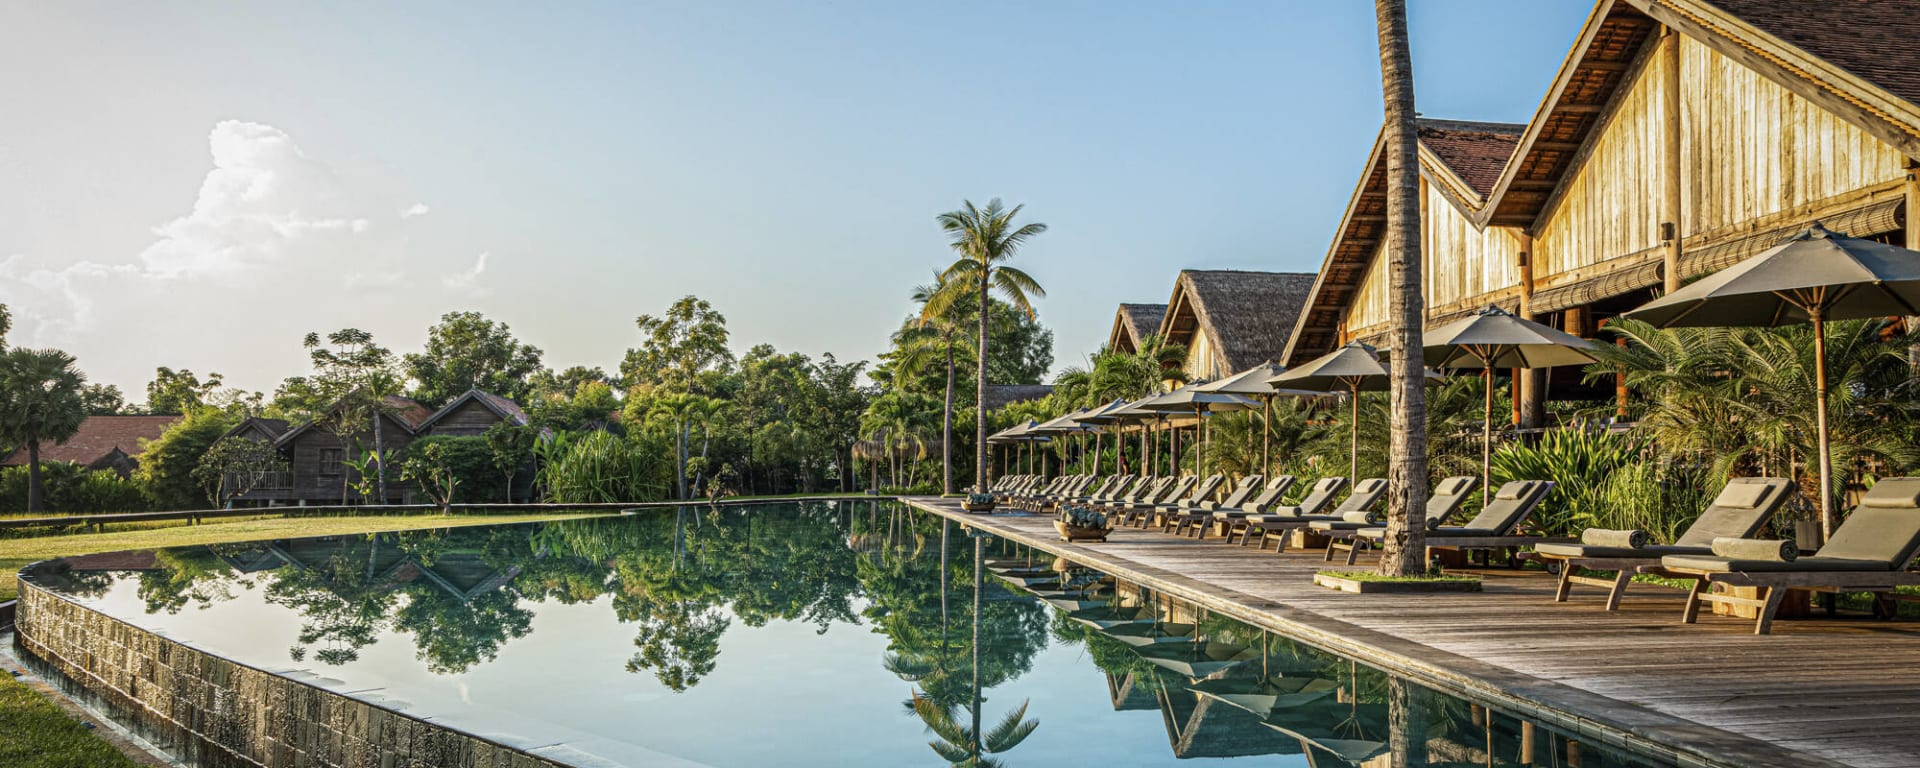 Zannier Hotels Phum Baitang in Siem Reap: Siem Reap Zannier Hotels Phum Baitang